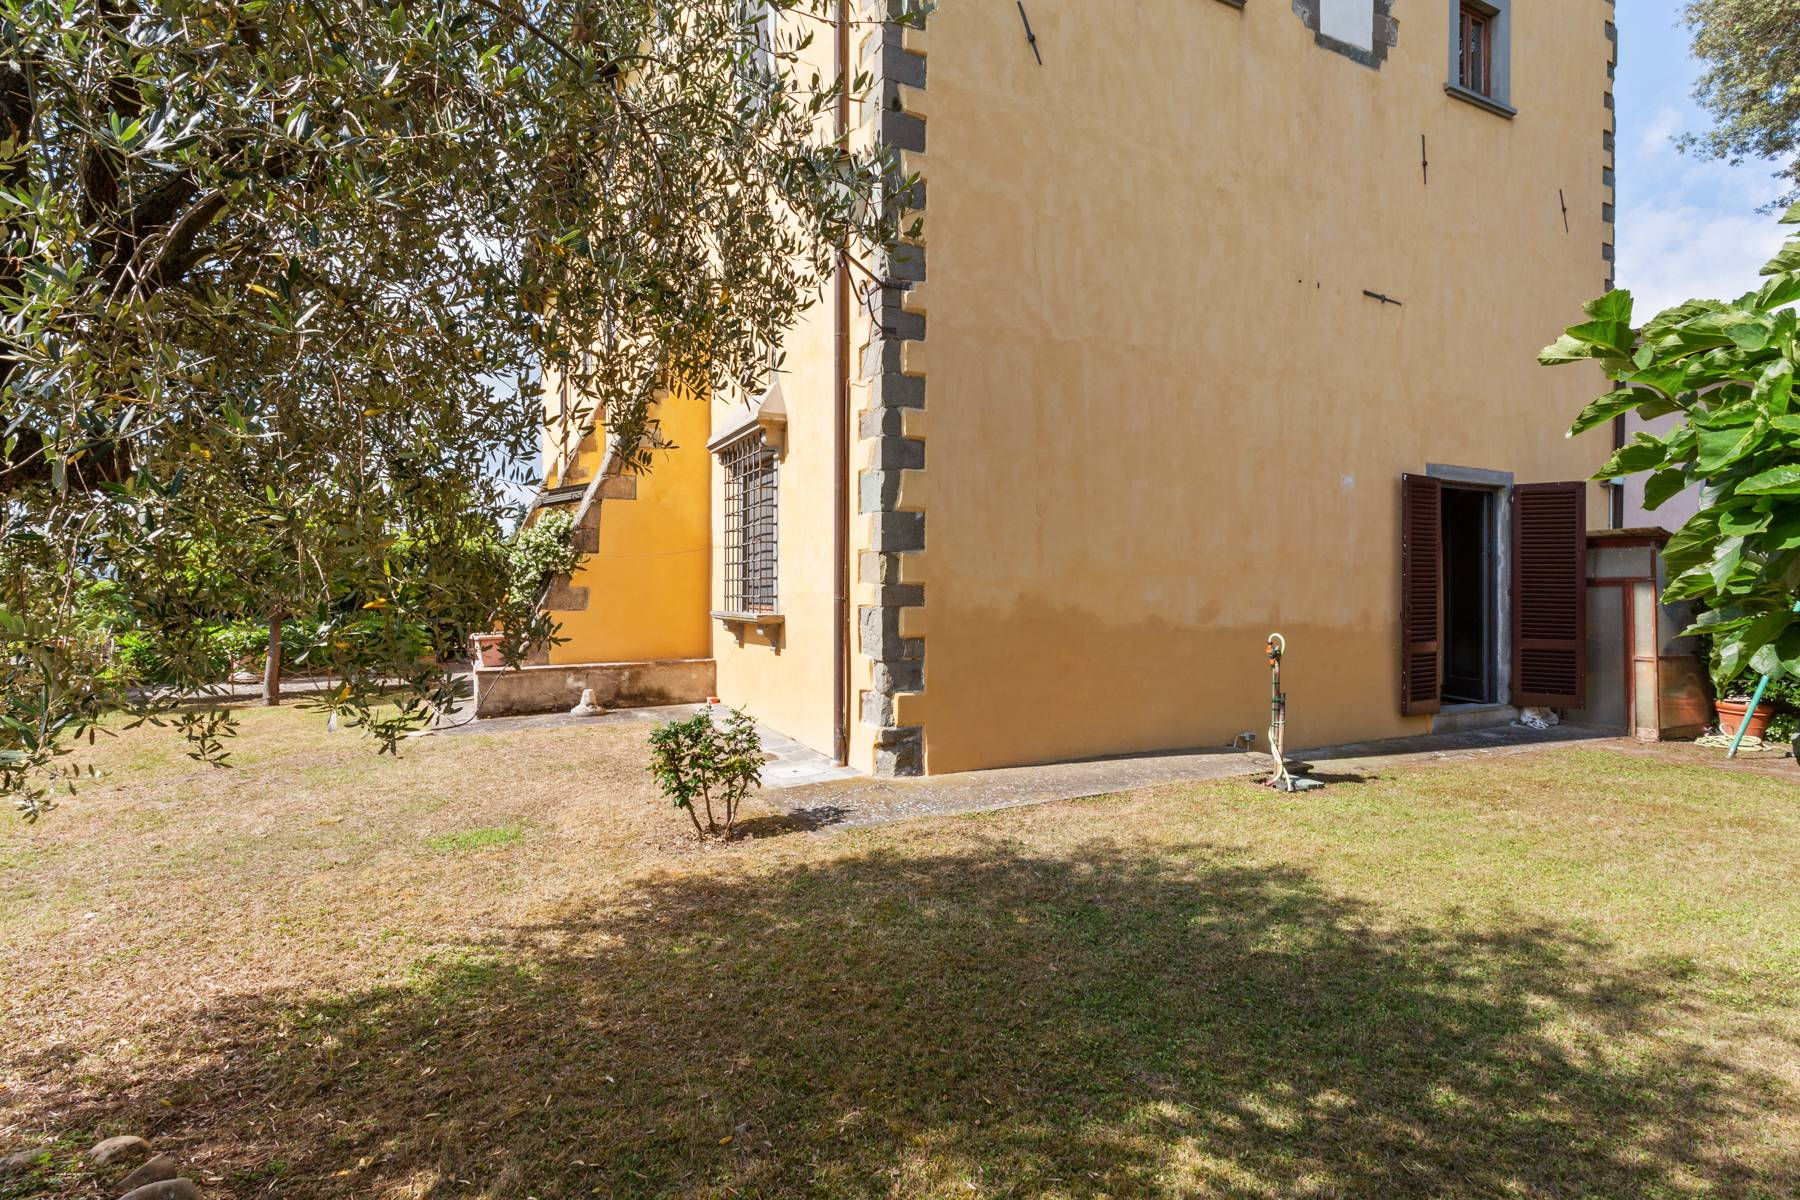 Appartamento in Vendita a Scandicci: 5 locali, 170 mq - Foto 16